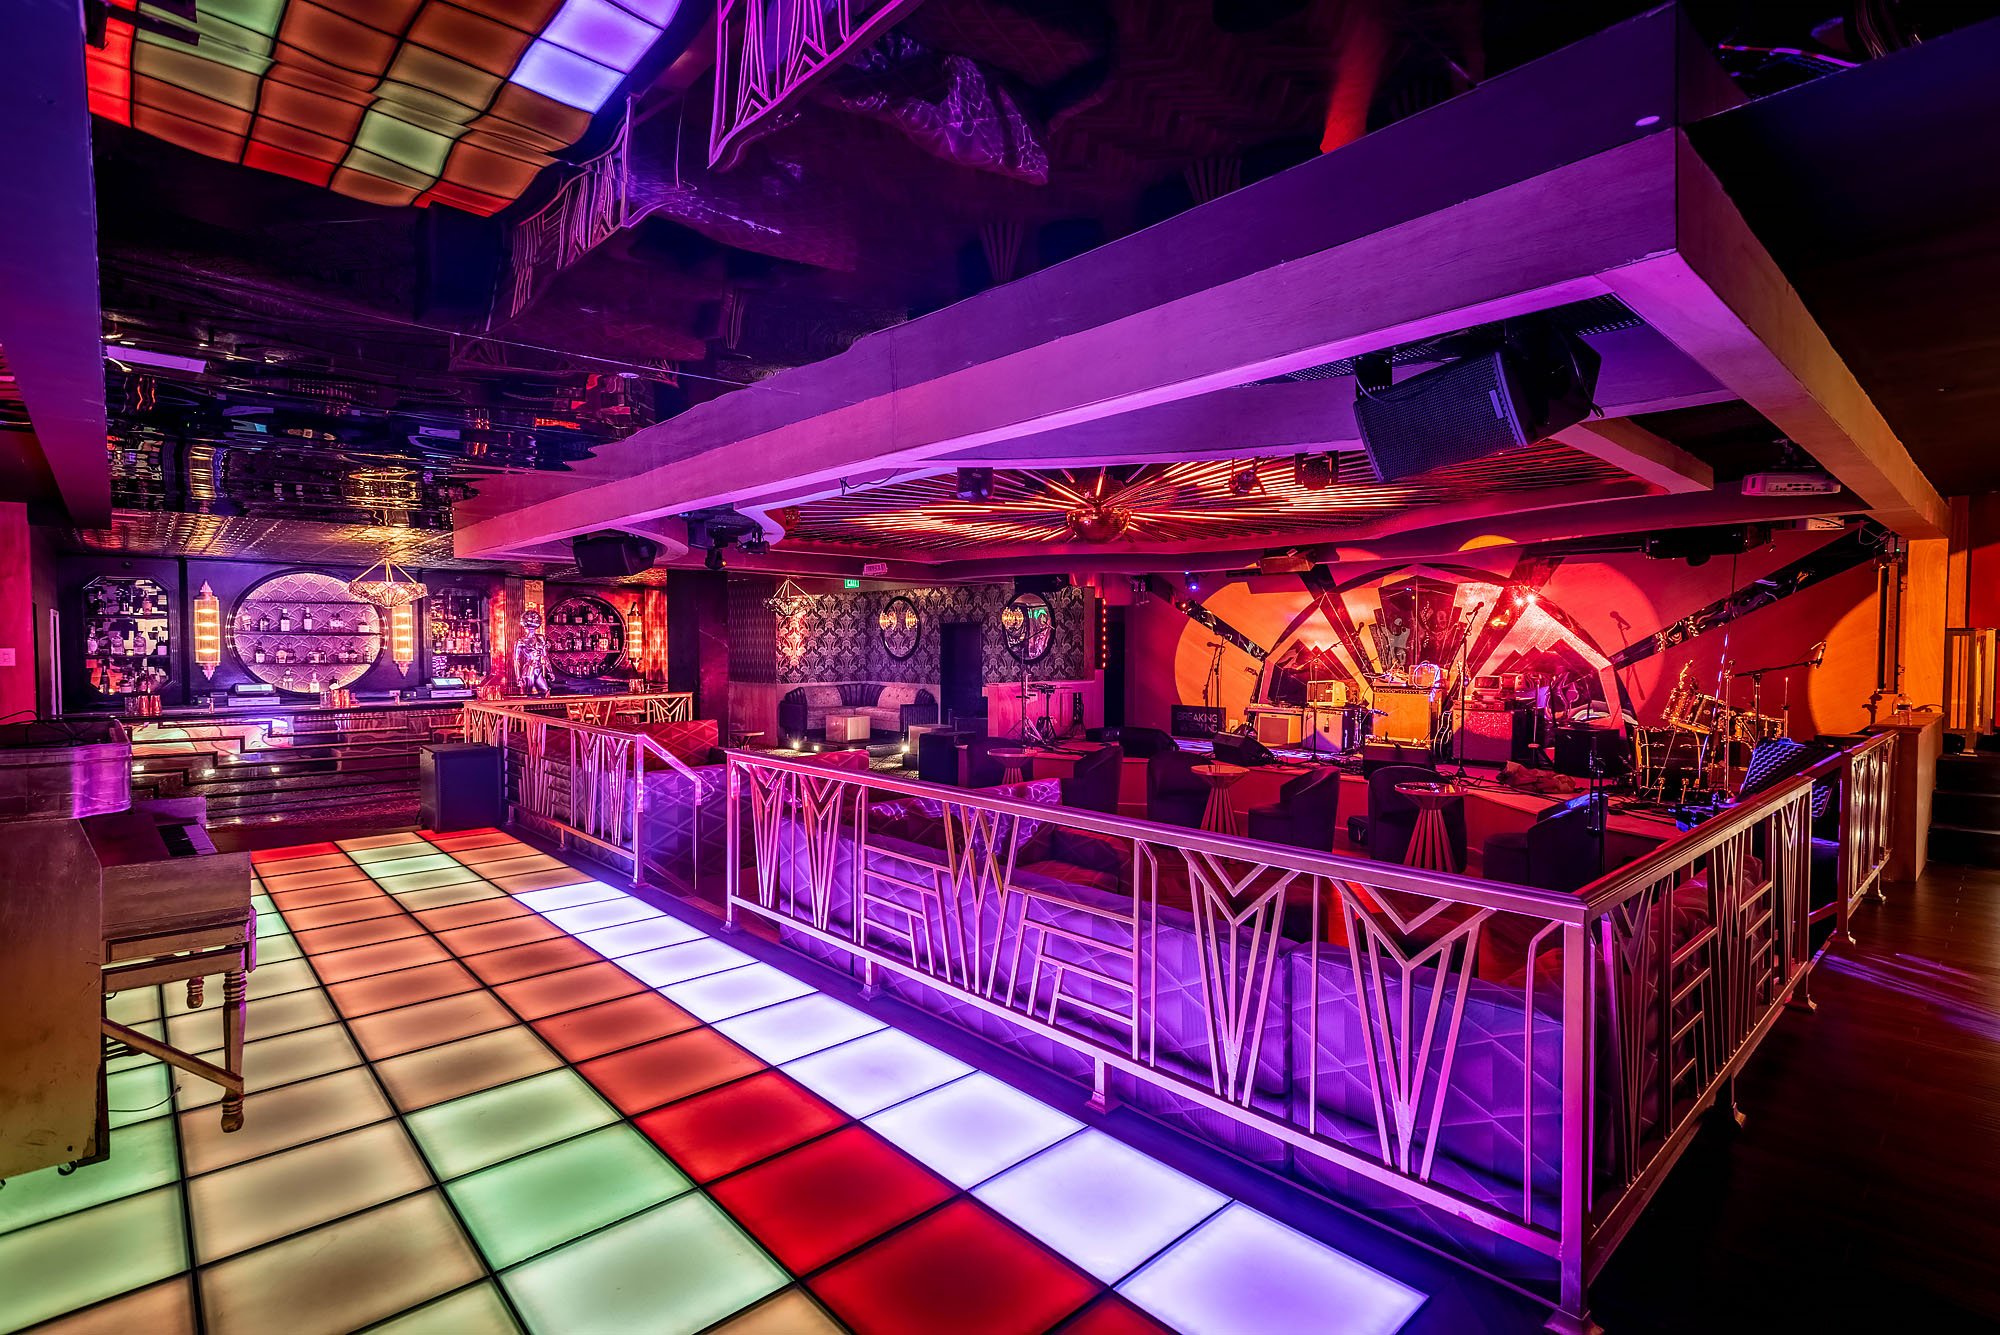 Colorful multi-paneled dance floor and stage at Kiss Kiss Bang Bang, Koreatown, Los Angeles.